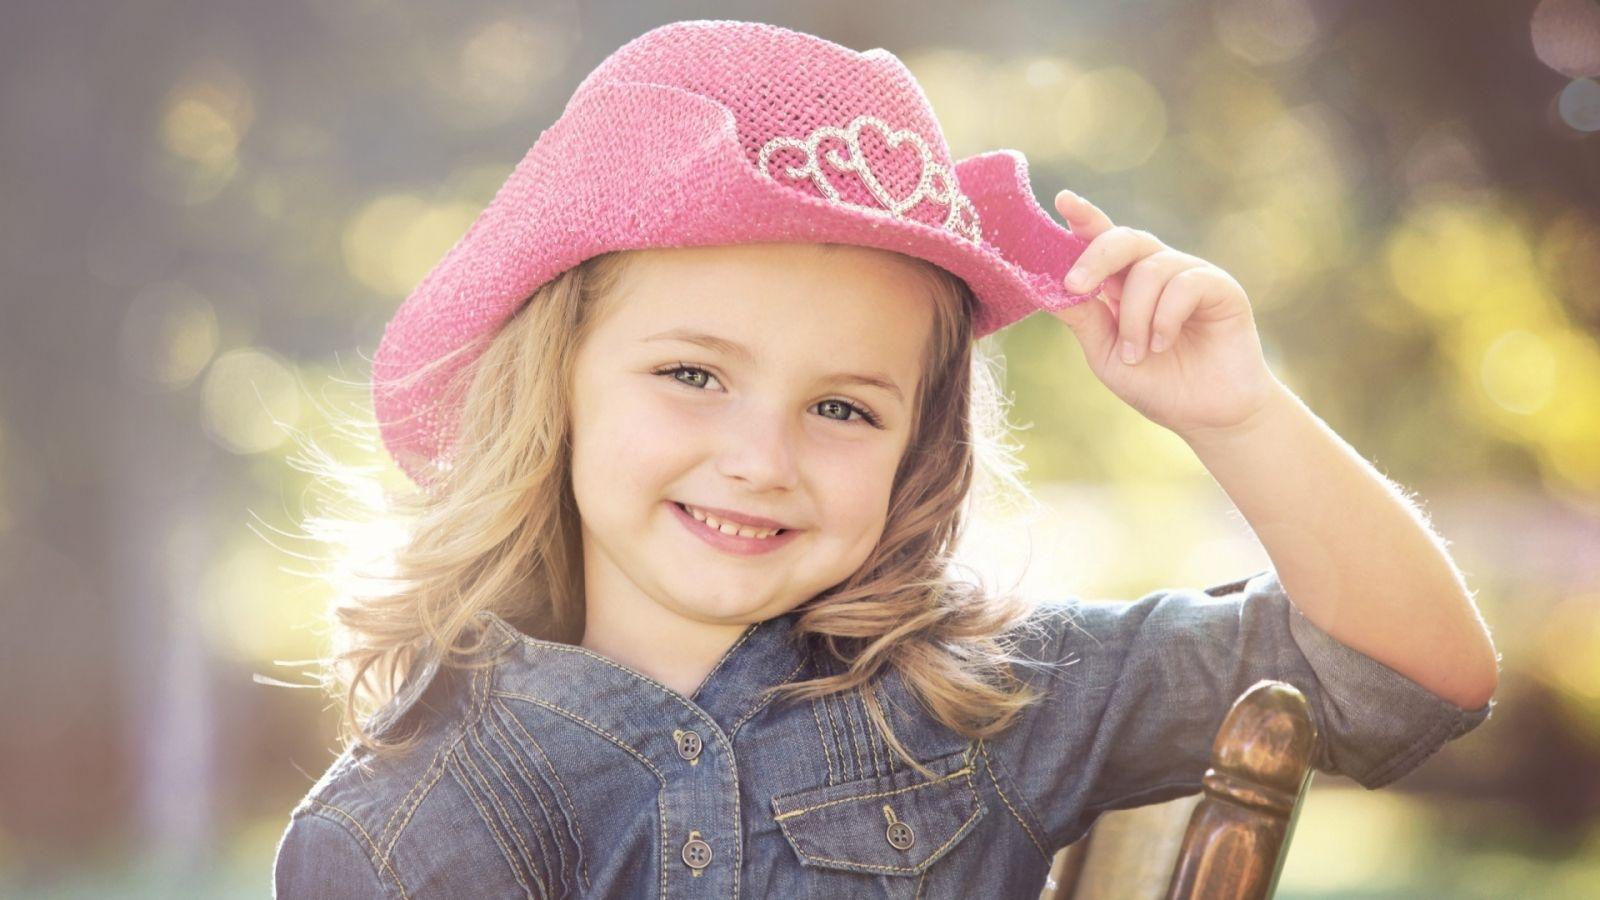 بالصور فتيات جميلات , صور بنات اطفال يجننوا 4374 8